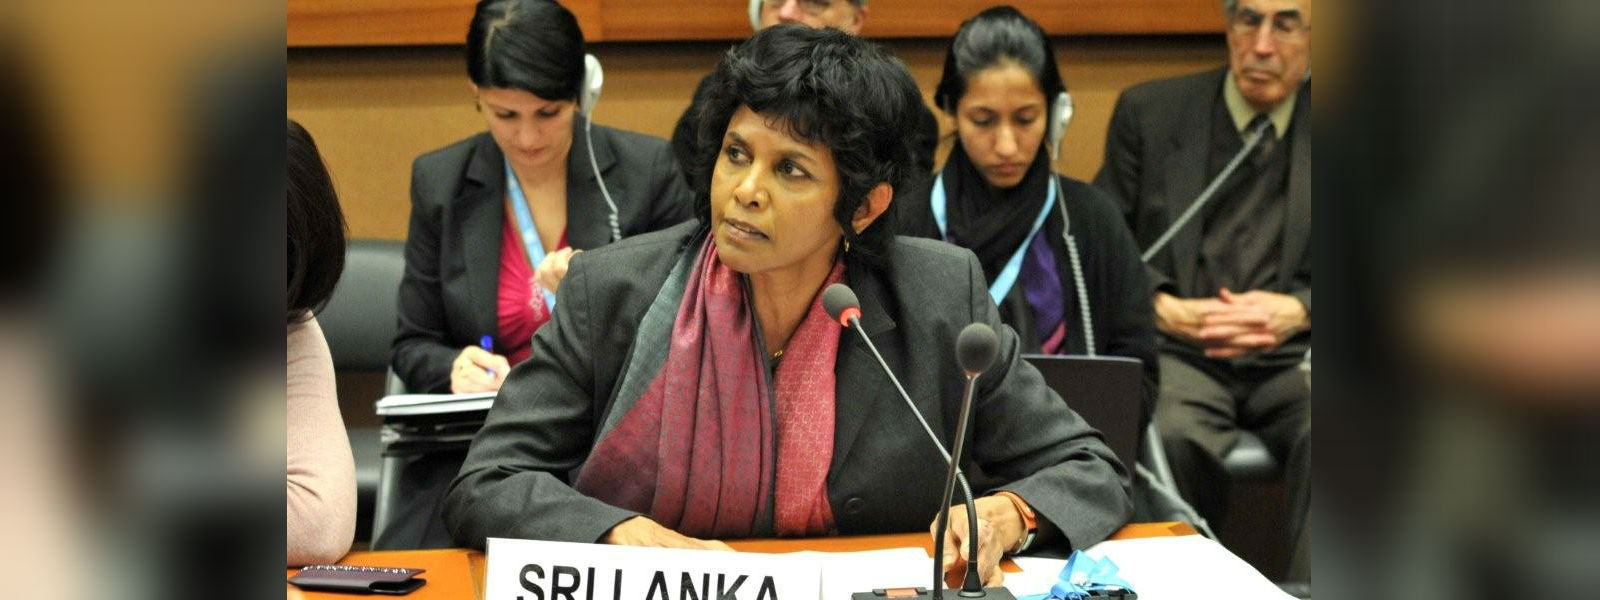 Countries that sign ACSA and SOFA are not non-aligned nations – TamaraKunanayakam